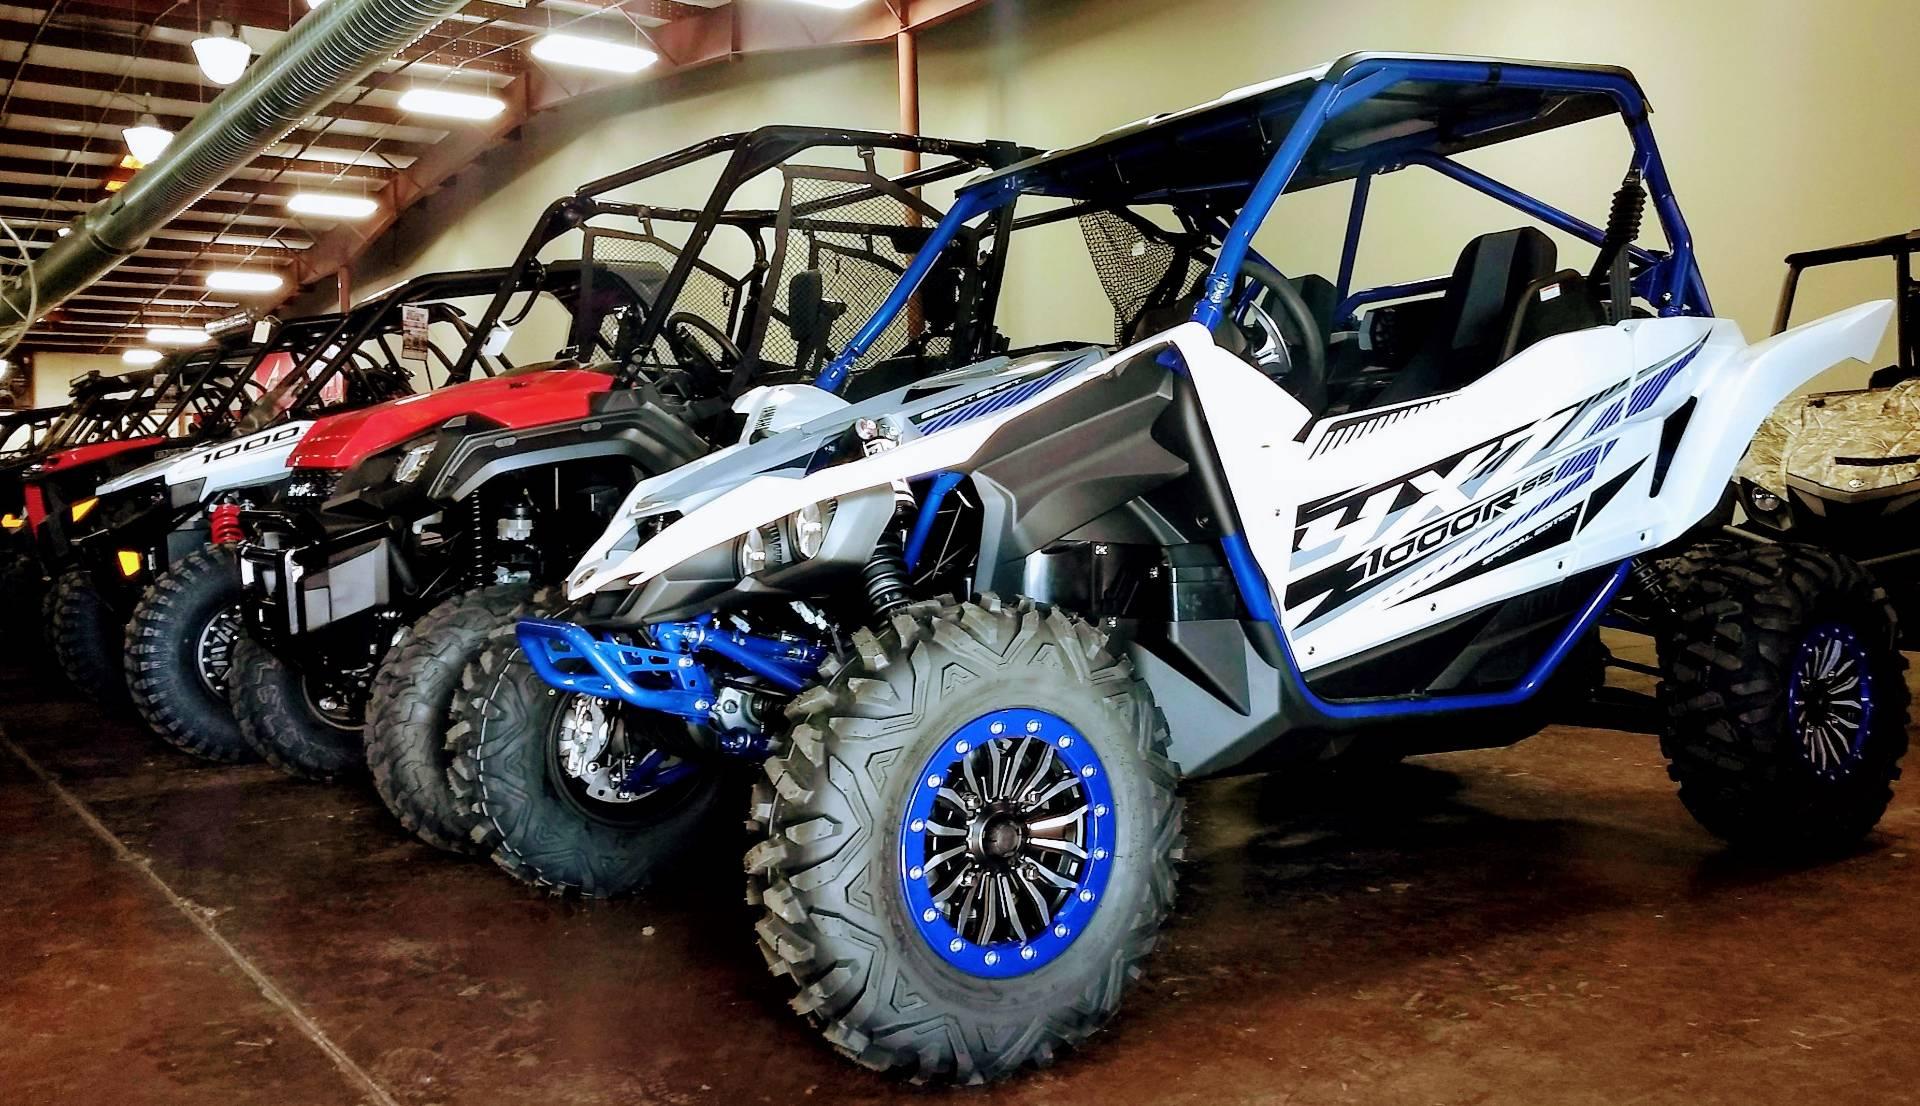 Yamaha Side By Side >> 2019 Yamaha Yxz1000r Ss Se In Statesville North Carolina